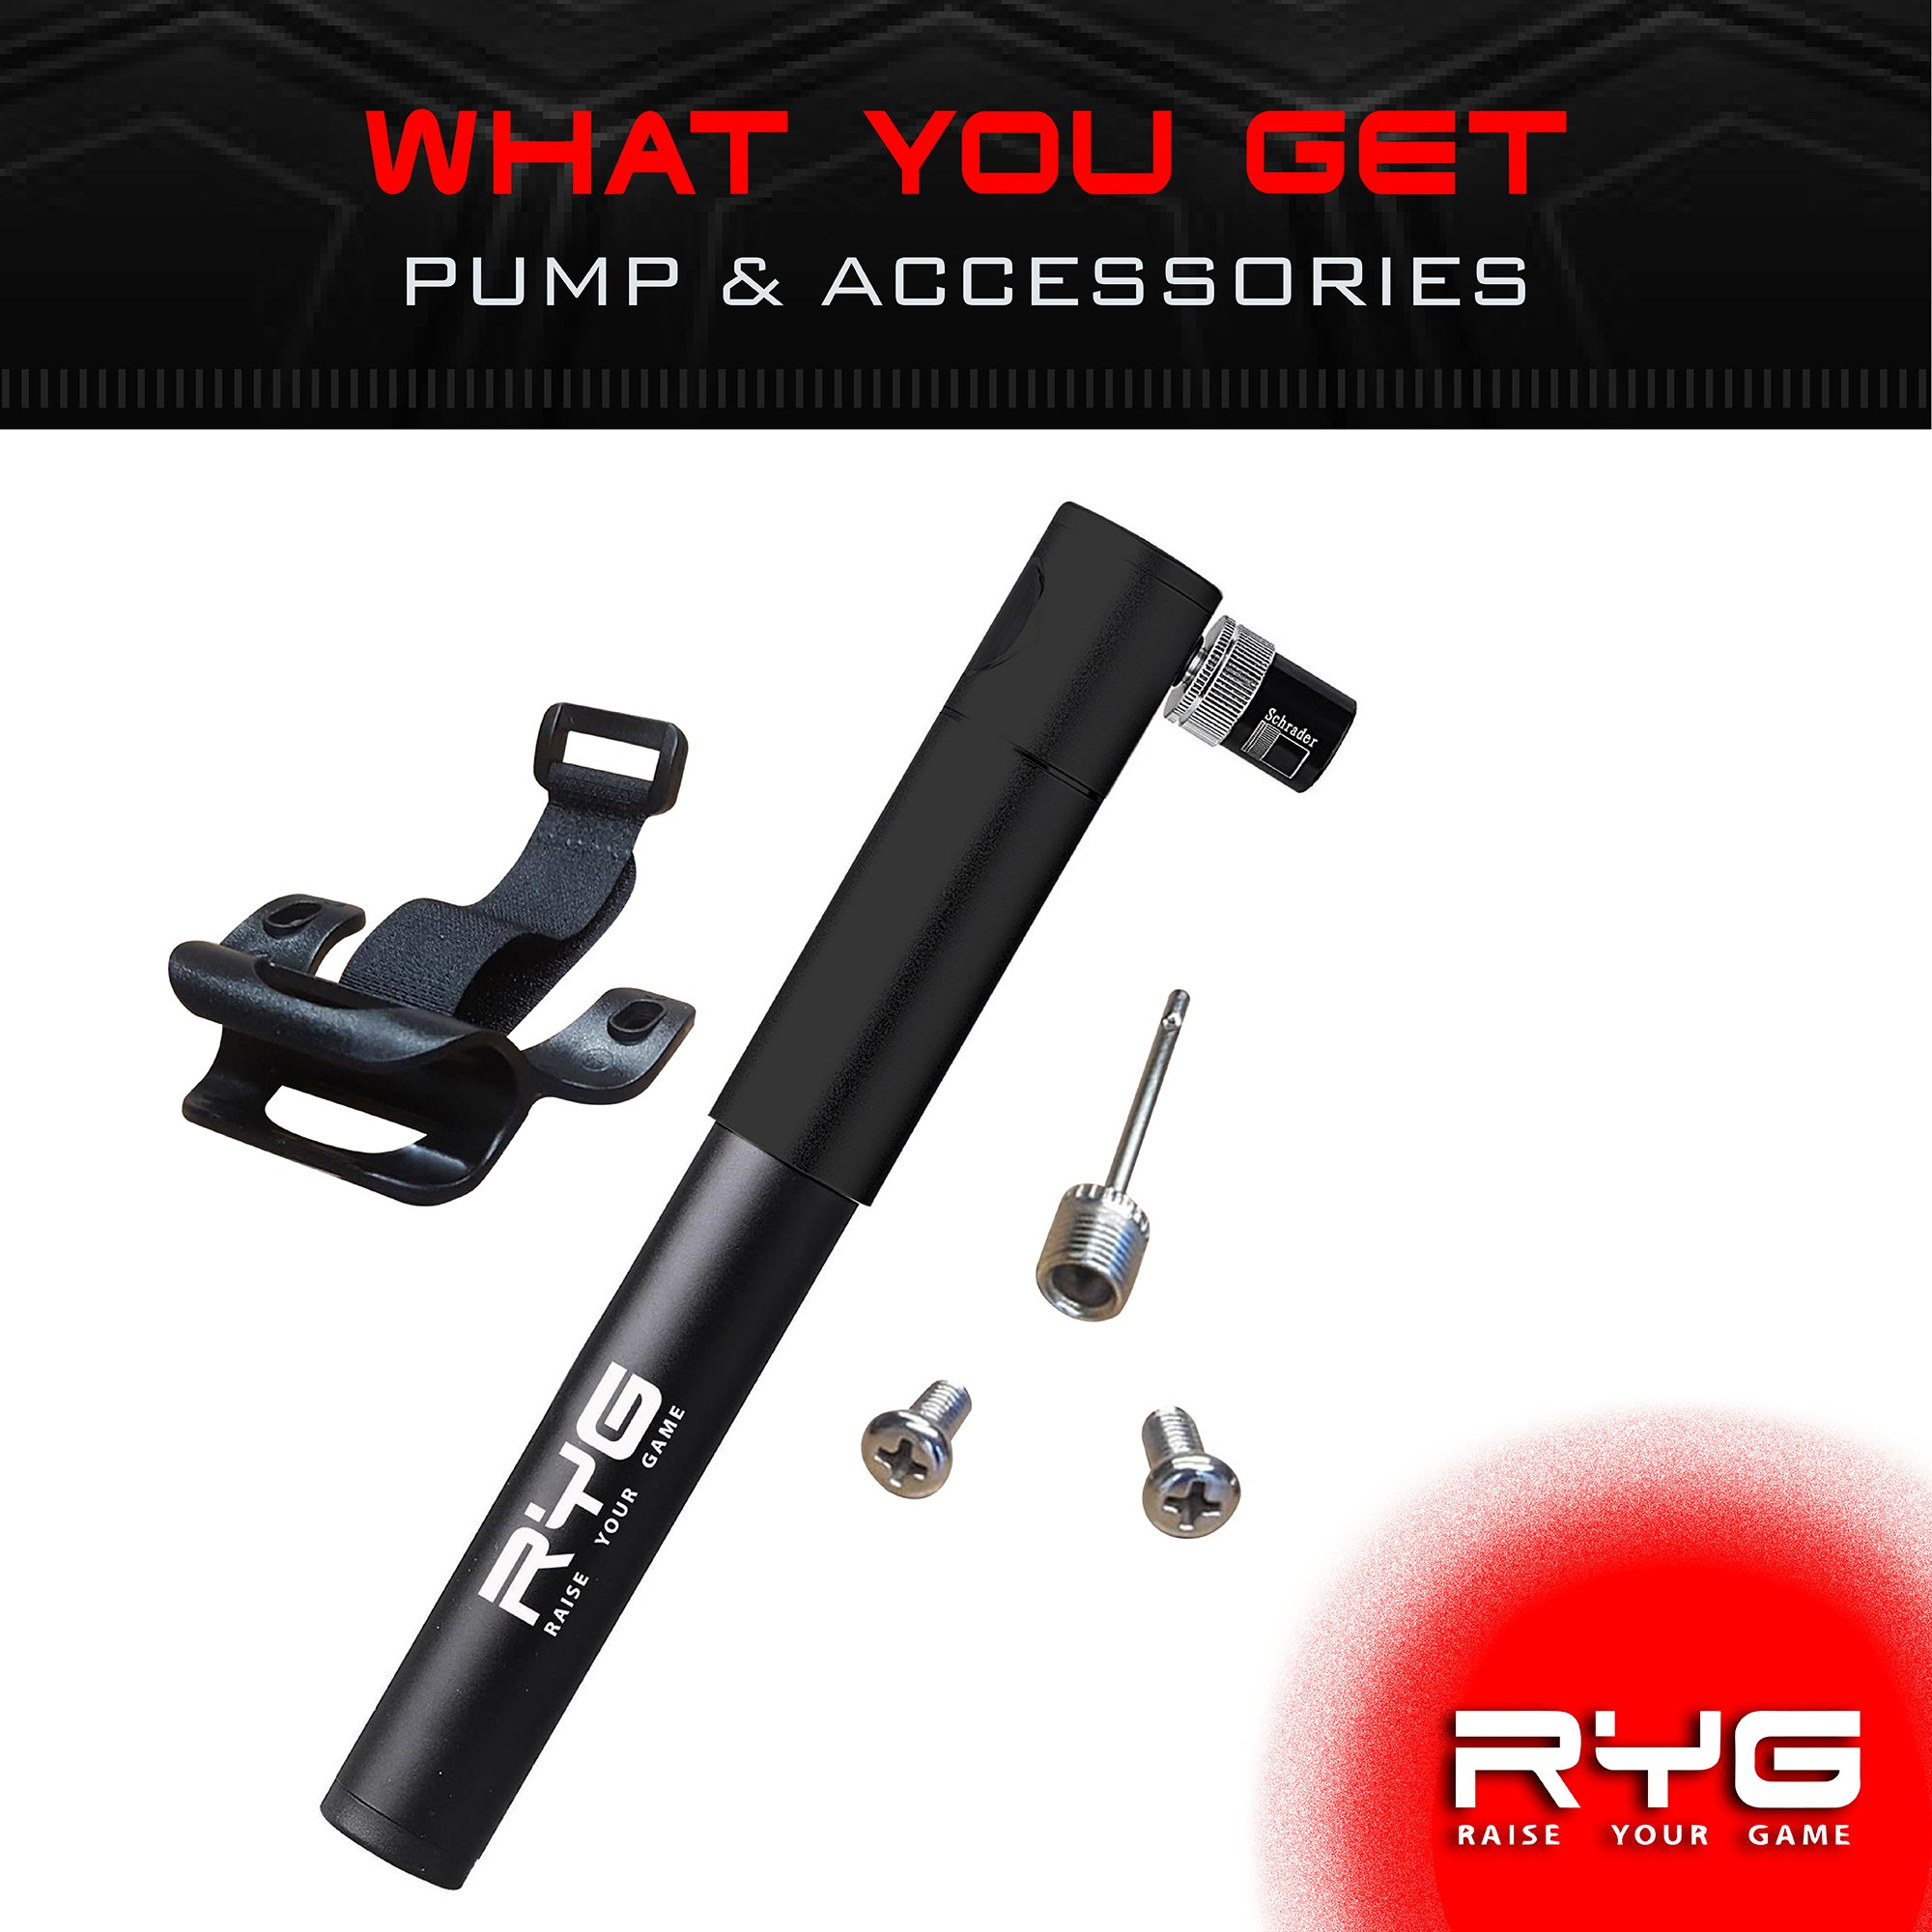 RYG Mini Bike Pump with Mounting Bracket, Portable Bicycle Tire Inflator with Air Pressure Gauge, Fits Presta & Schrader Valve, Mountain, Road, Hybrid & BMX Bikes, Lightweight Durable Aluminum Frame